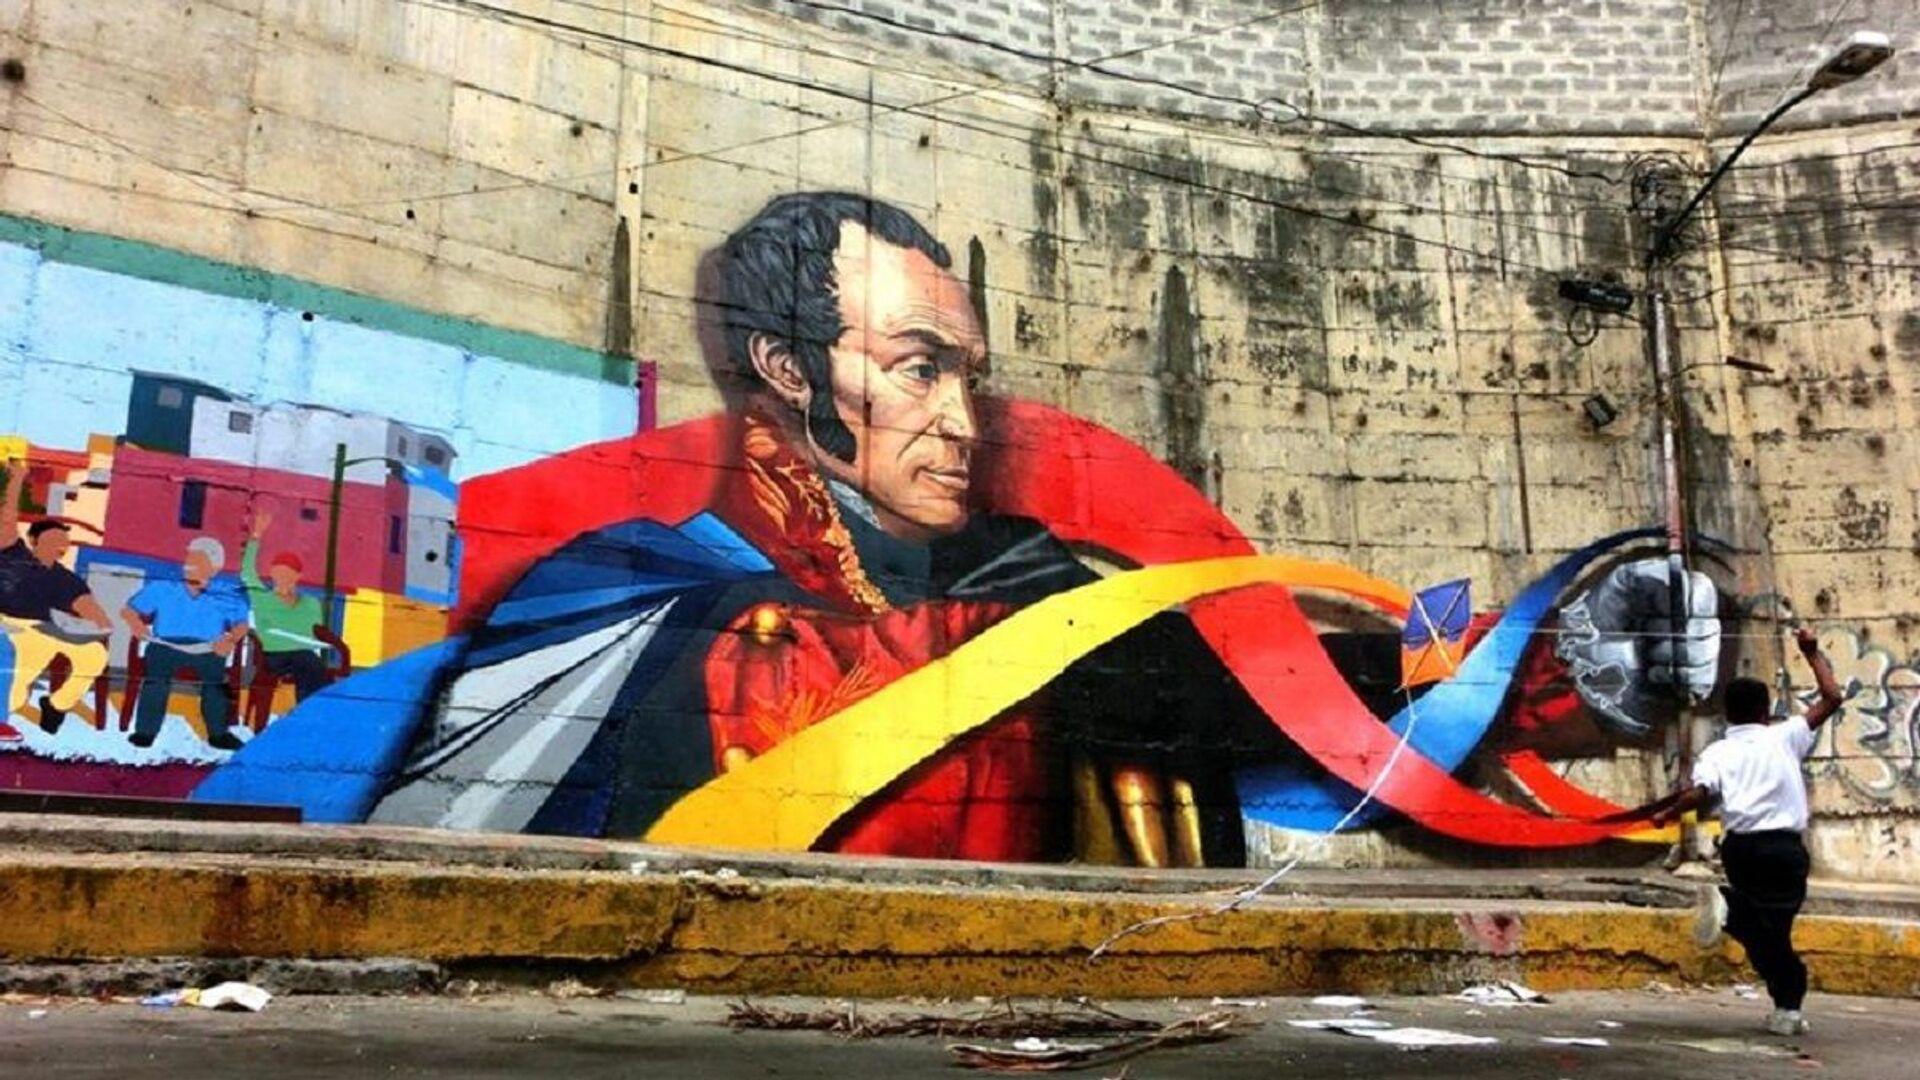 Mural de Simón Bolívar en Chapellín, Caracas - Sputnik Mundo, 1920, 25.06.2021